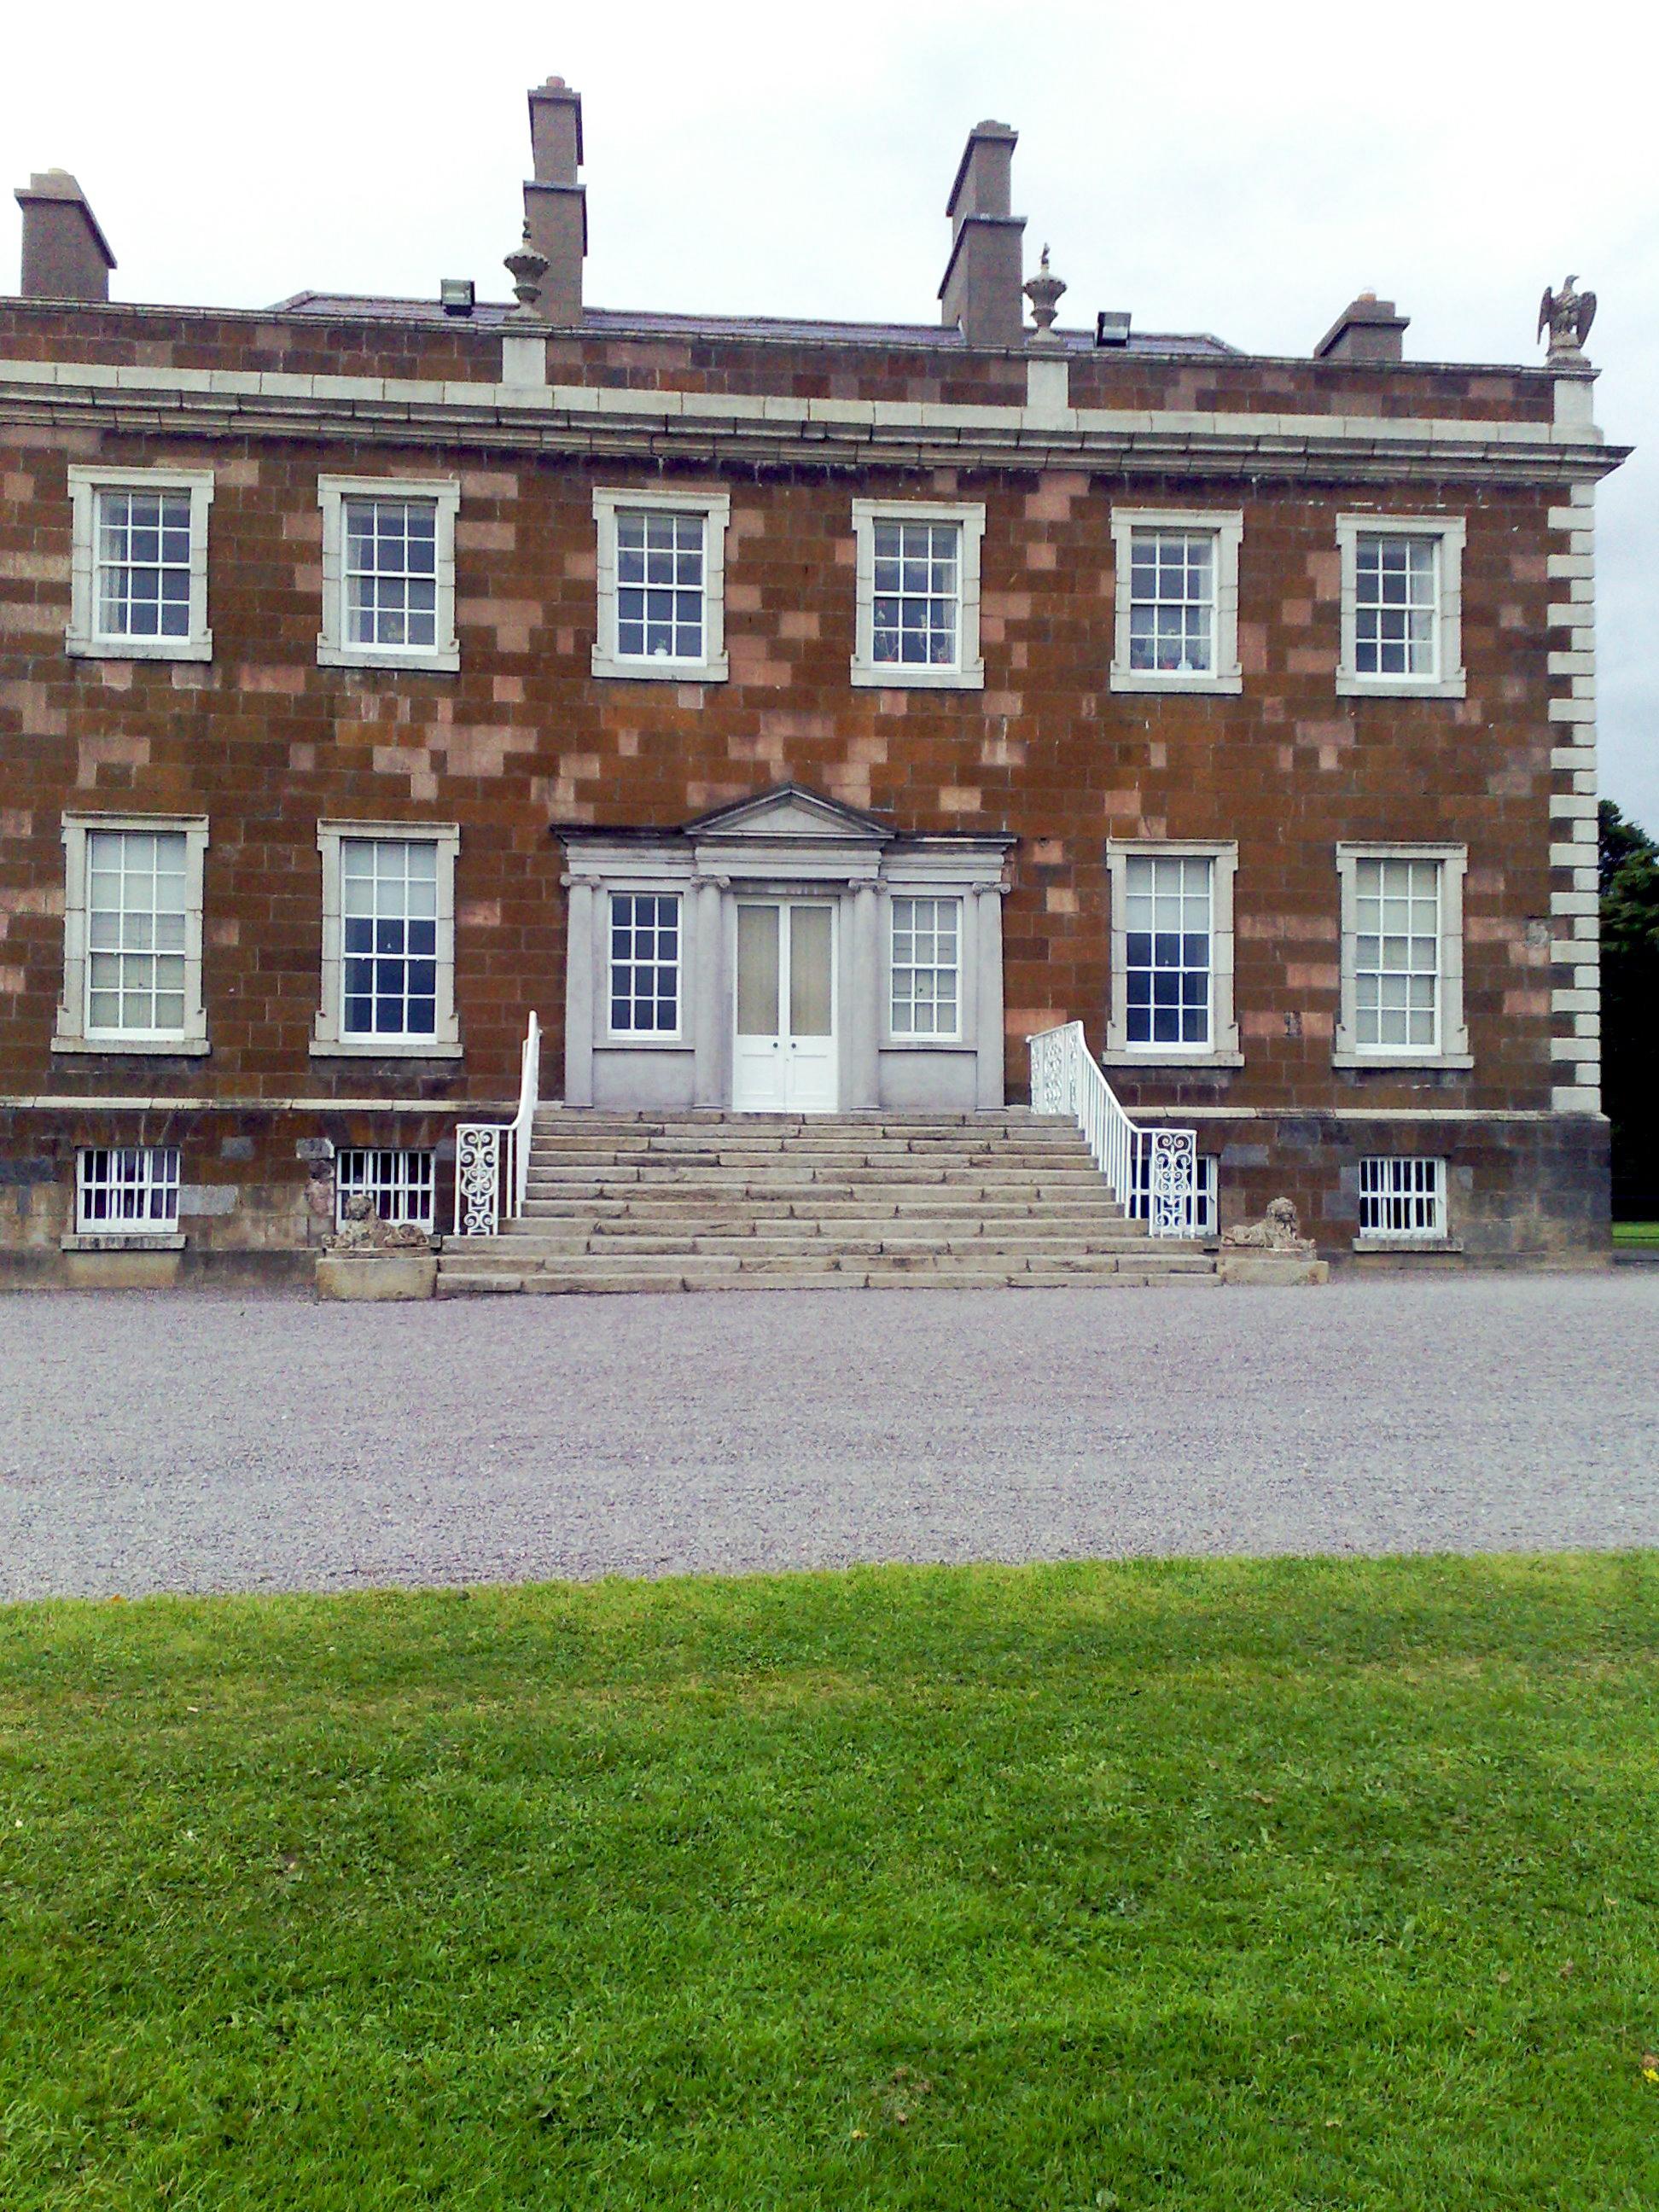 Newsletter | Donabate, Portrane & Balheary Parish | We would